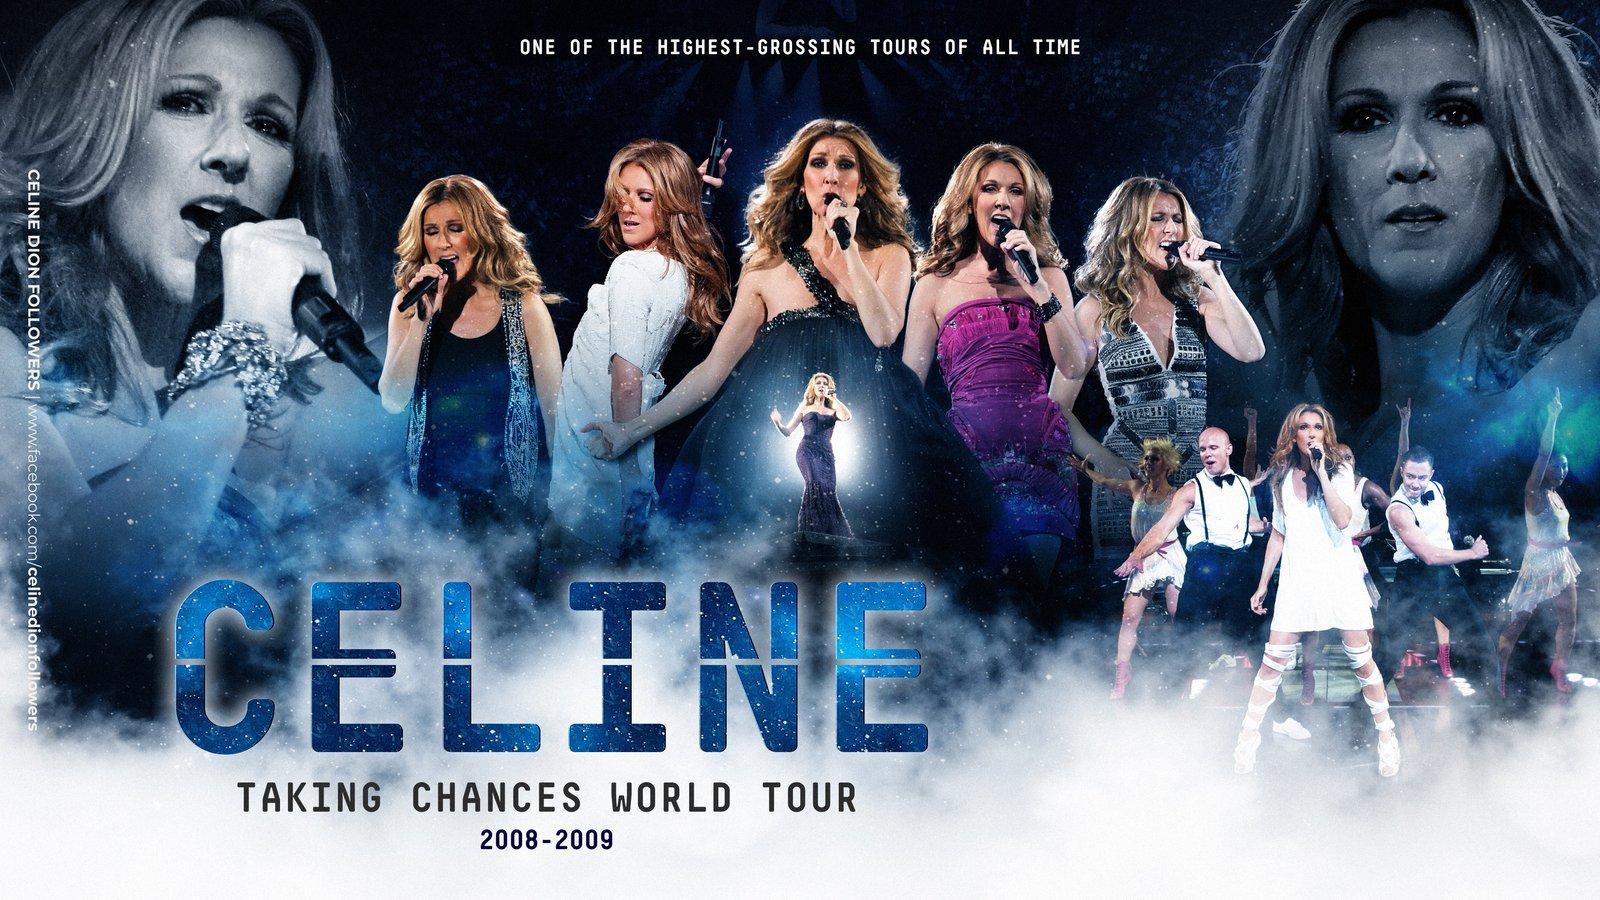 TAKING CHANCES WORLD TOUR